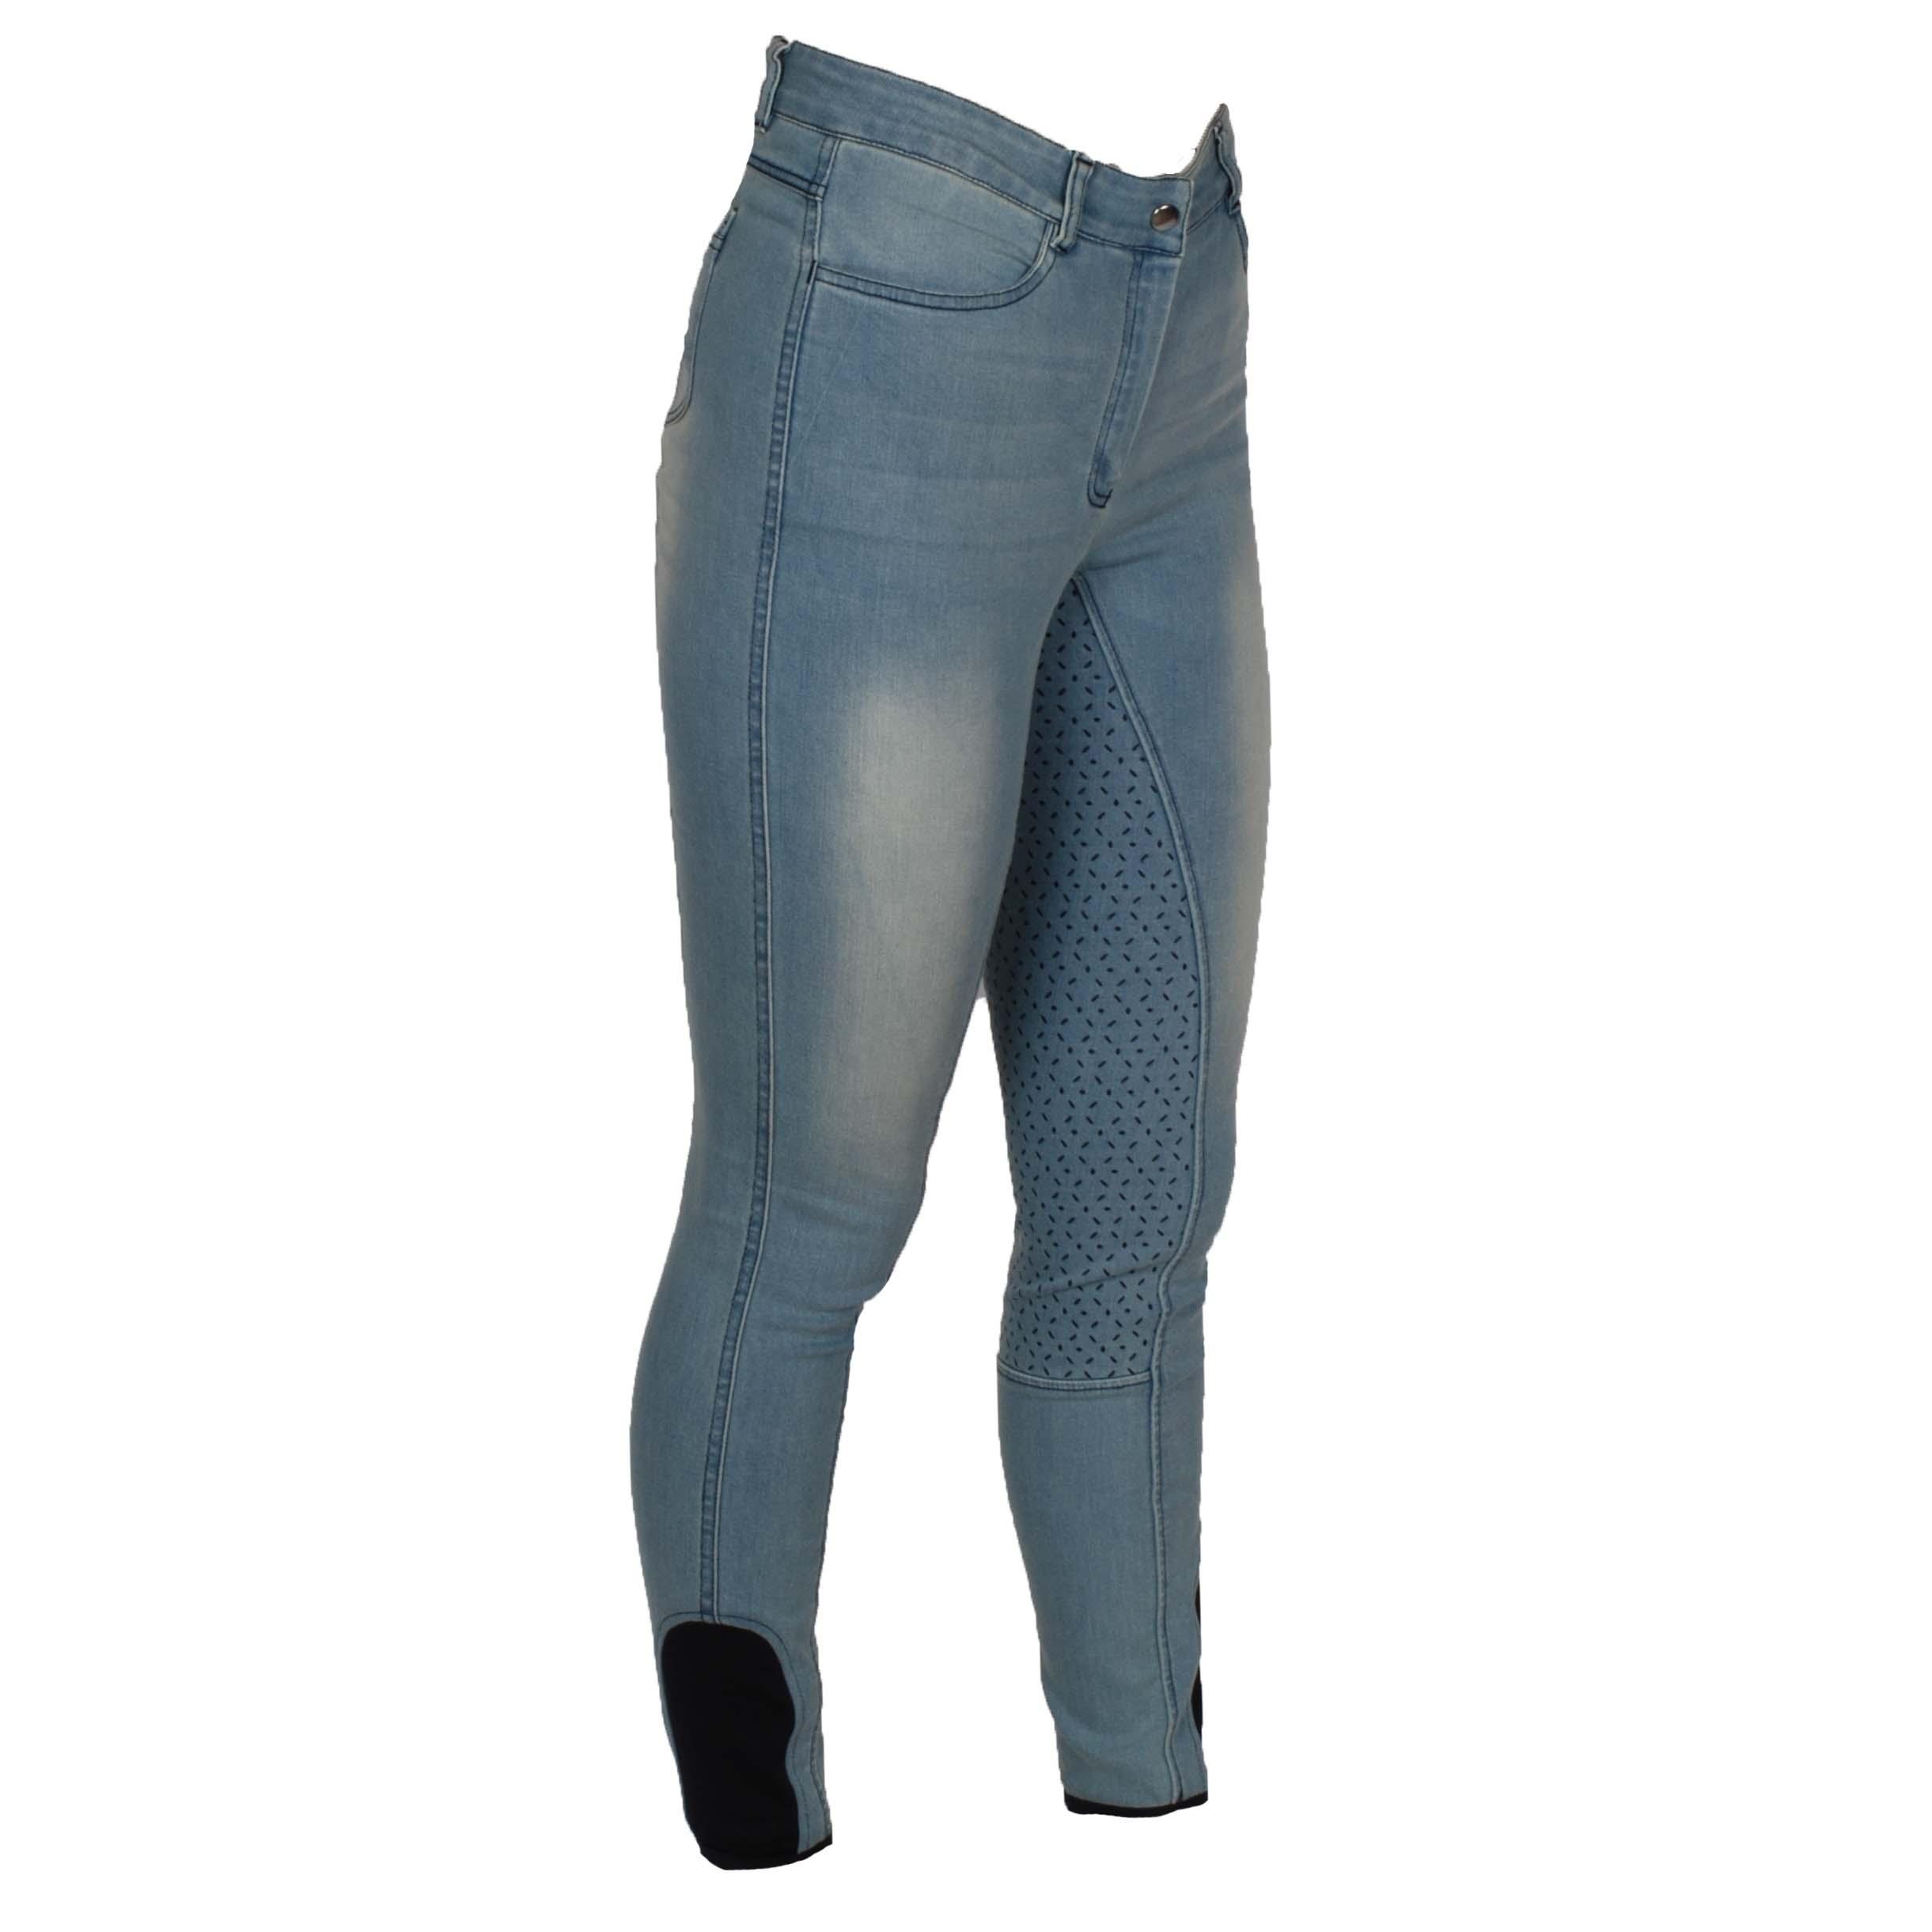 Mondoni Bellville jeans FG rijbroek jeans maat:34